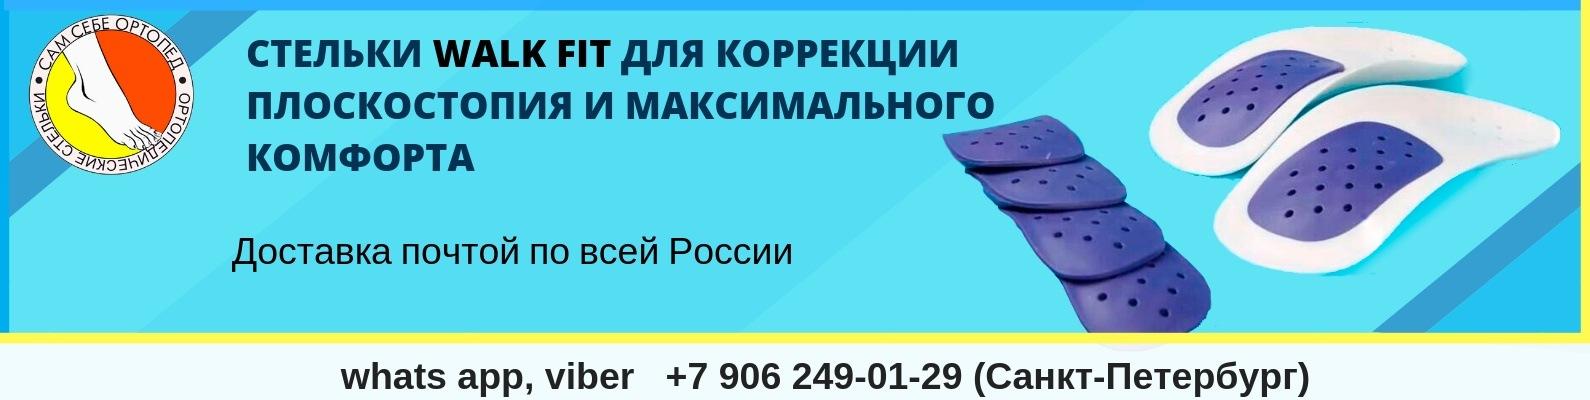 d6199ccb8 Сам себе ортопед. Санкт-Петербург | ВКонтакте